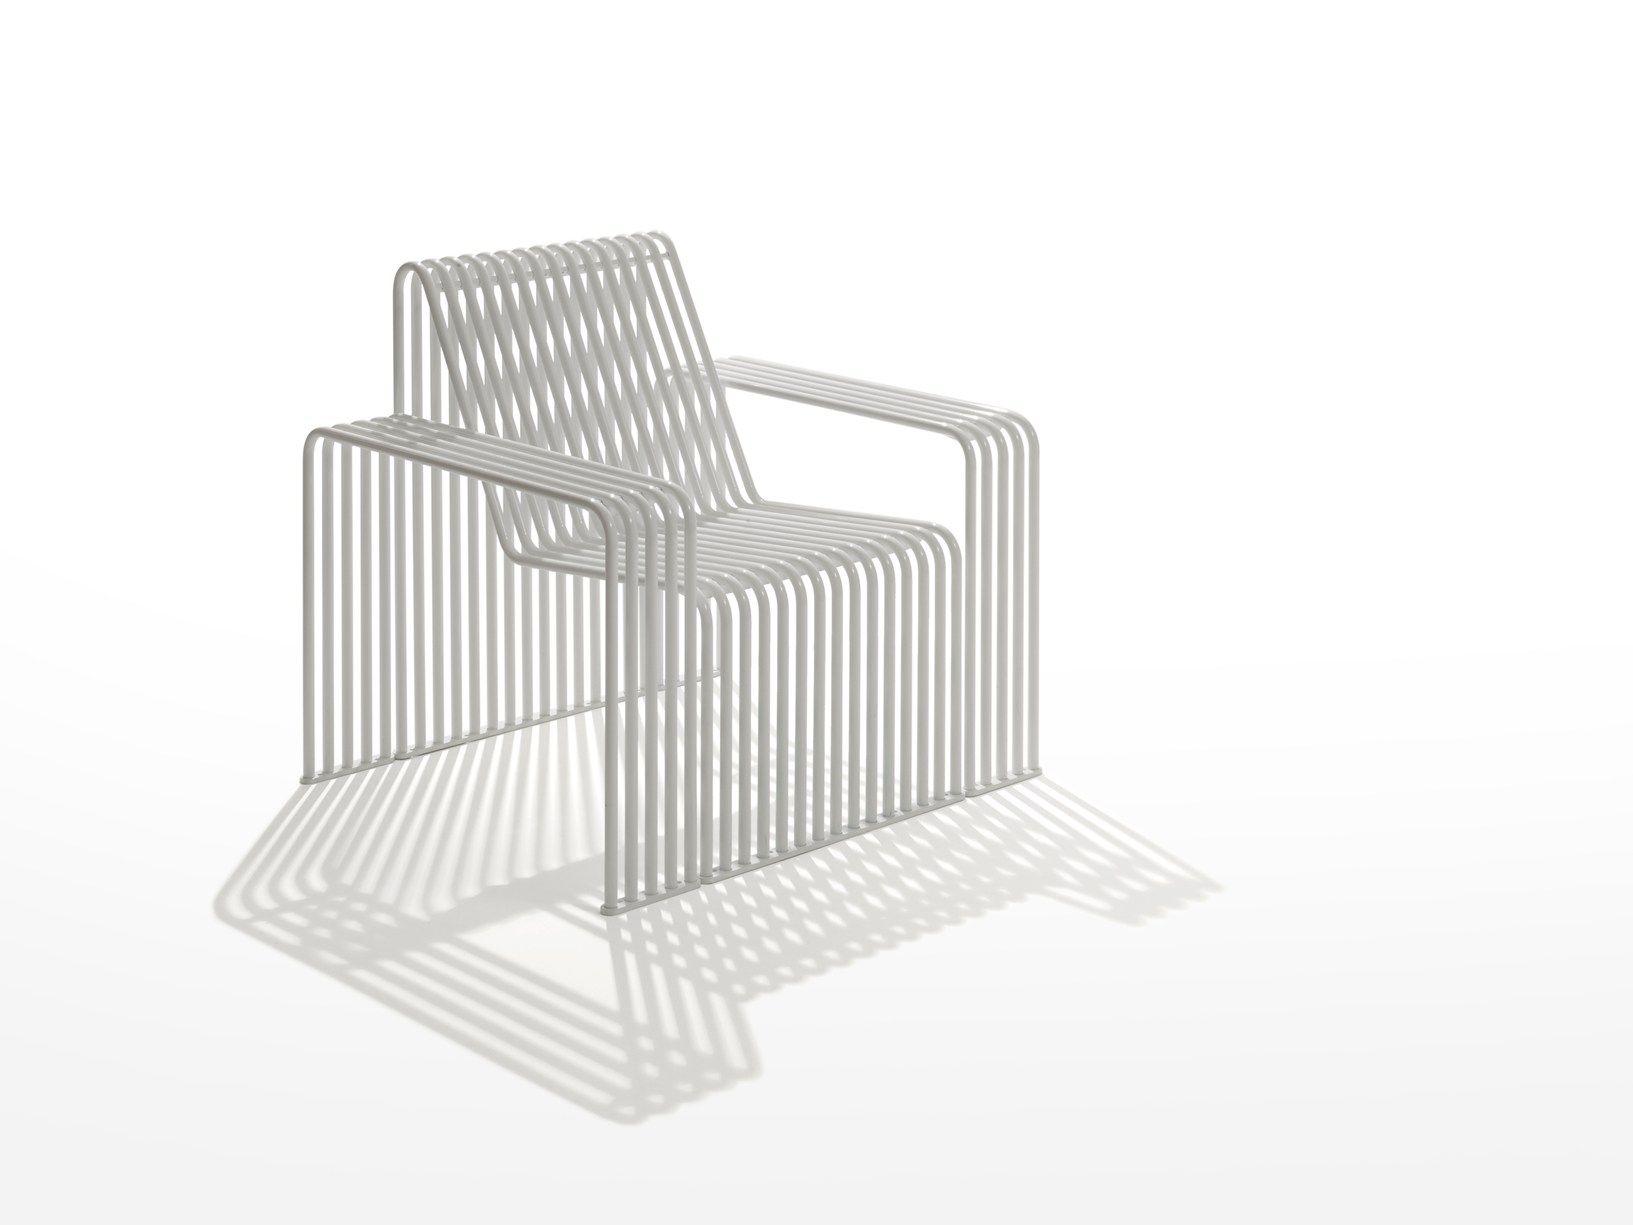 0.15 Zeroquindici Sofa: the urban sofa